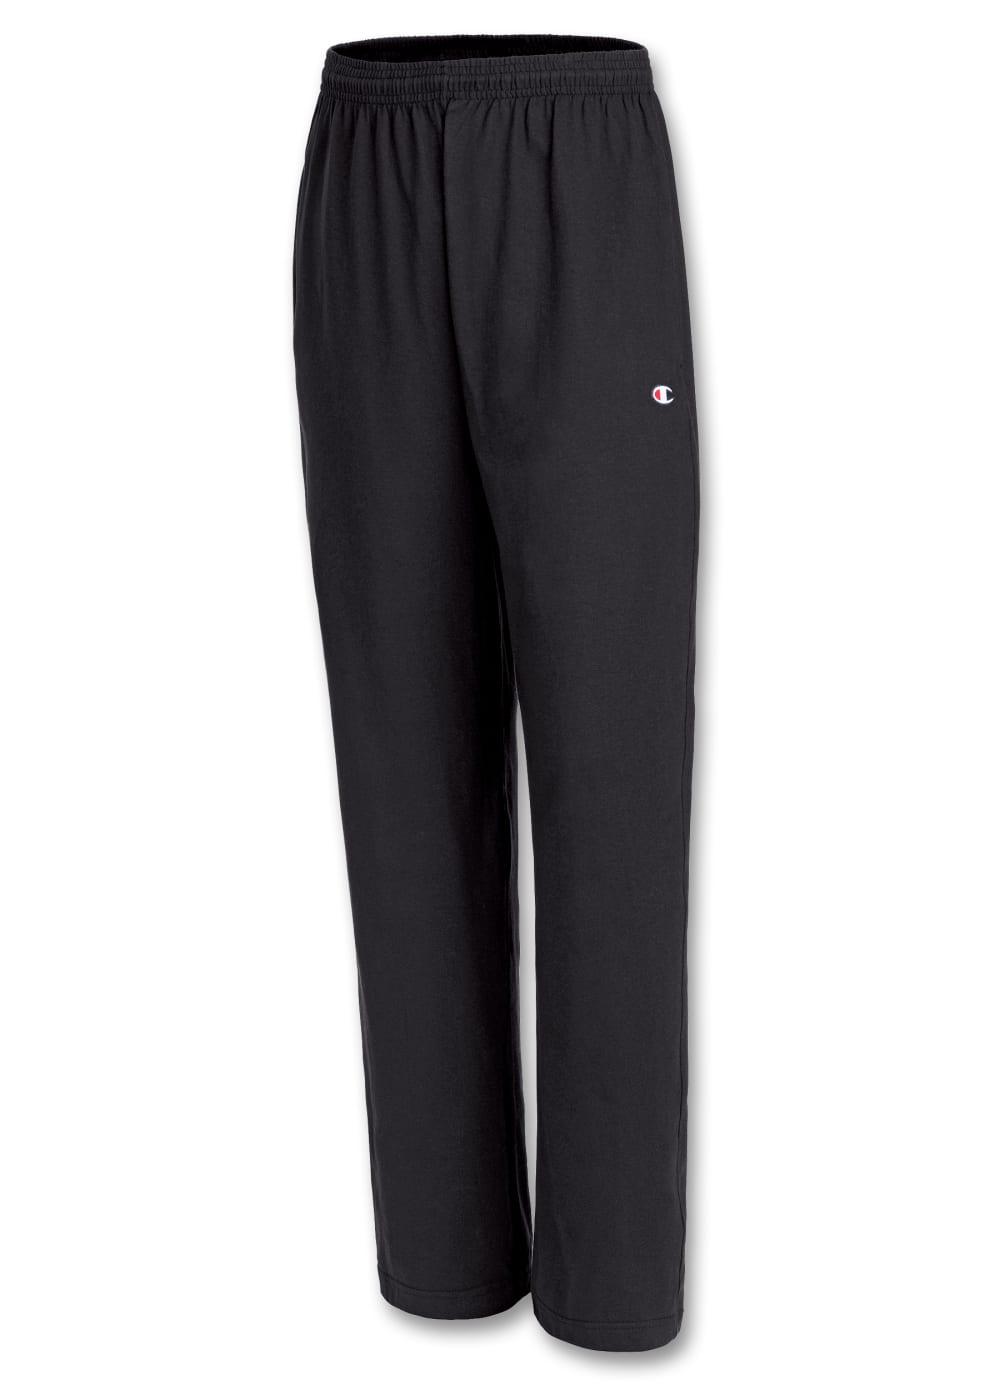 CHAMPION Men's Cotton Jersey Pants - BLACK-003